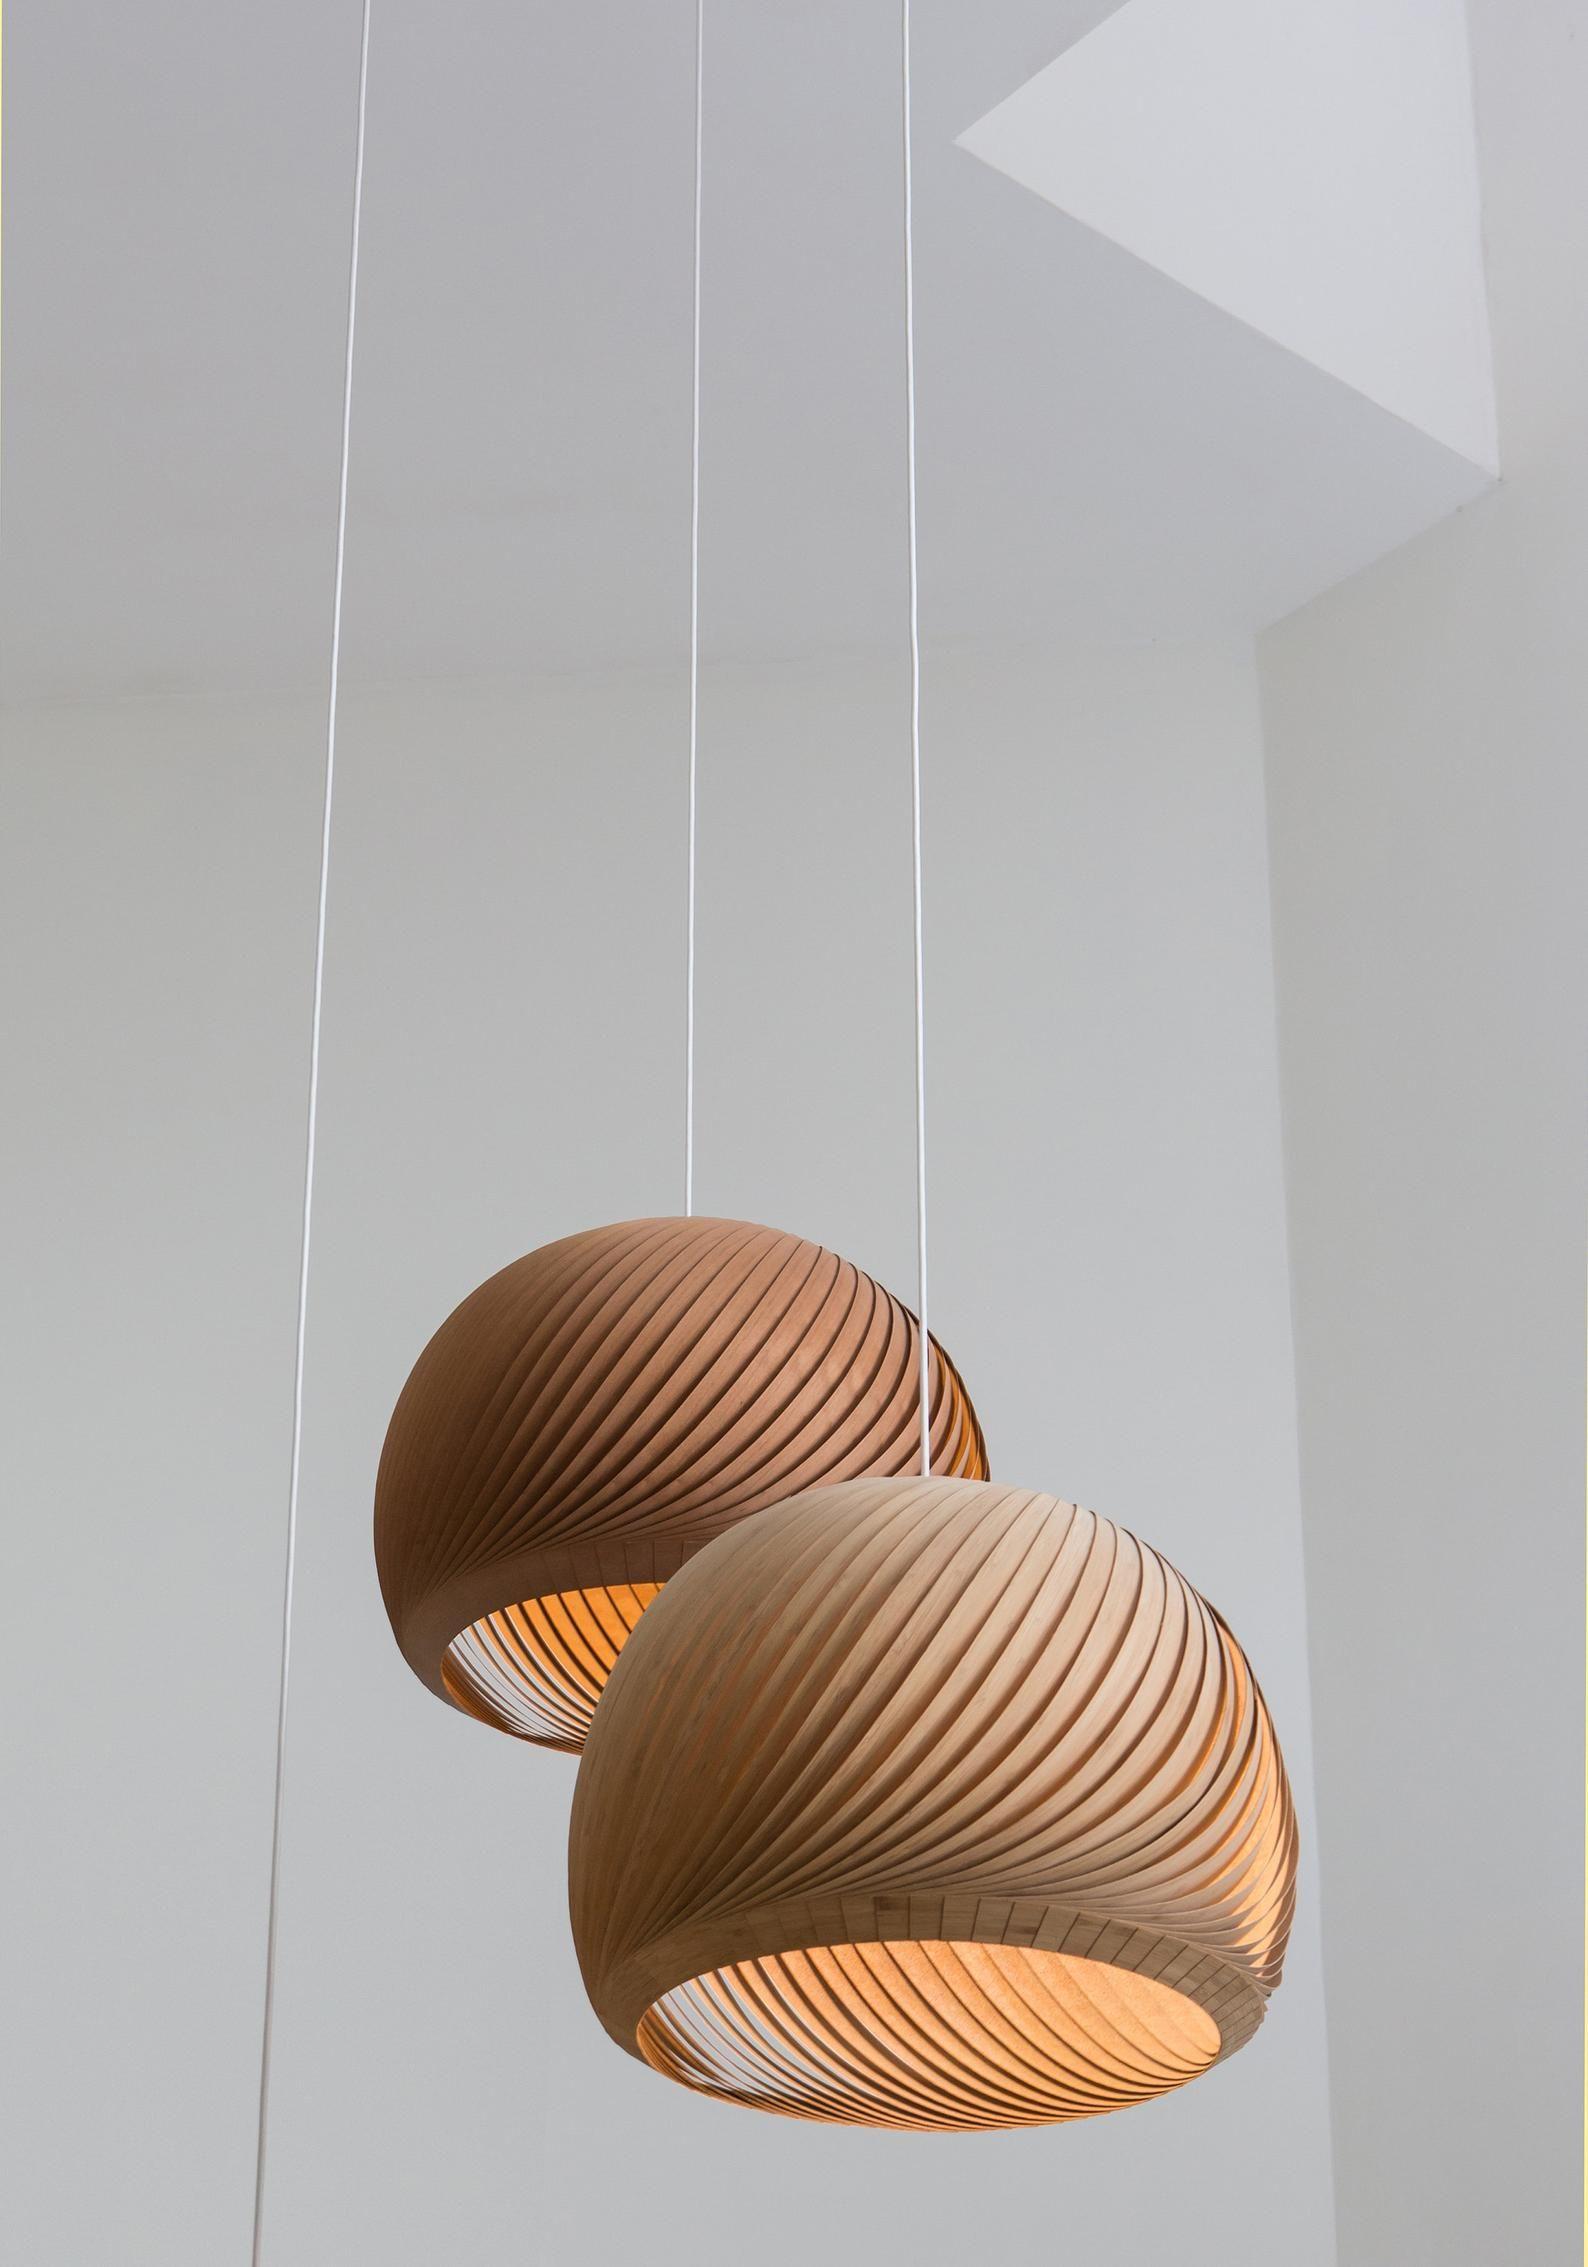 Dining table lamp Bamboo Pendant Lamp | Iluminação